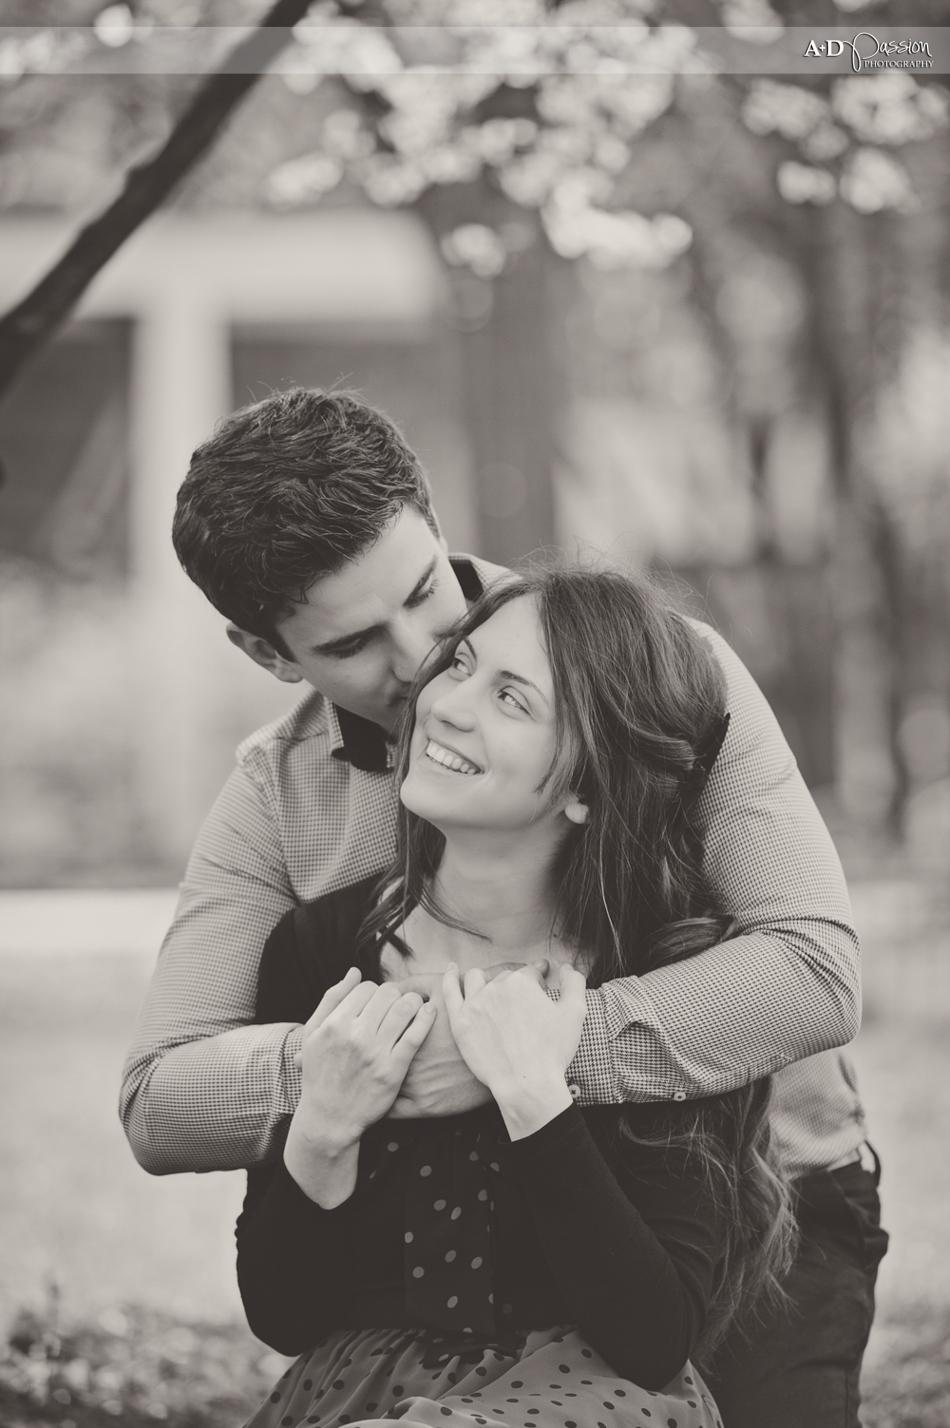 AD Passion Photography | fotograf-profesionist-nunta_couples_diana-si-adi_0026 | Adelin, Dida, fotograf profesionist, fotograf de nunta, fotografie de nunta, fotograf Timisoara, fotograf Craiova, fotograf Bucuresti, fotograf Arad, nunta Timisoara, nunta Arad, nunta Bucuresti, nunta Craiova